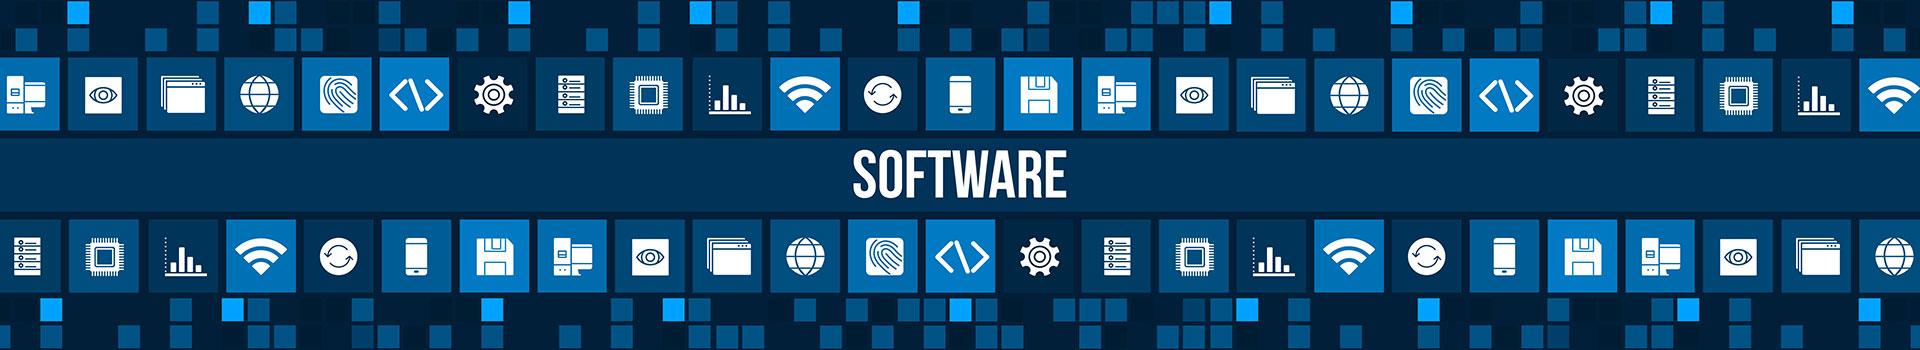 software2.jpg - 133.17 kB